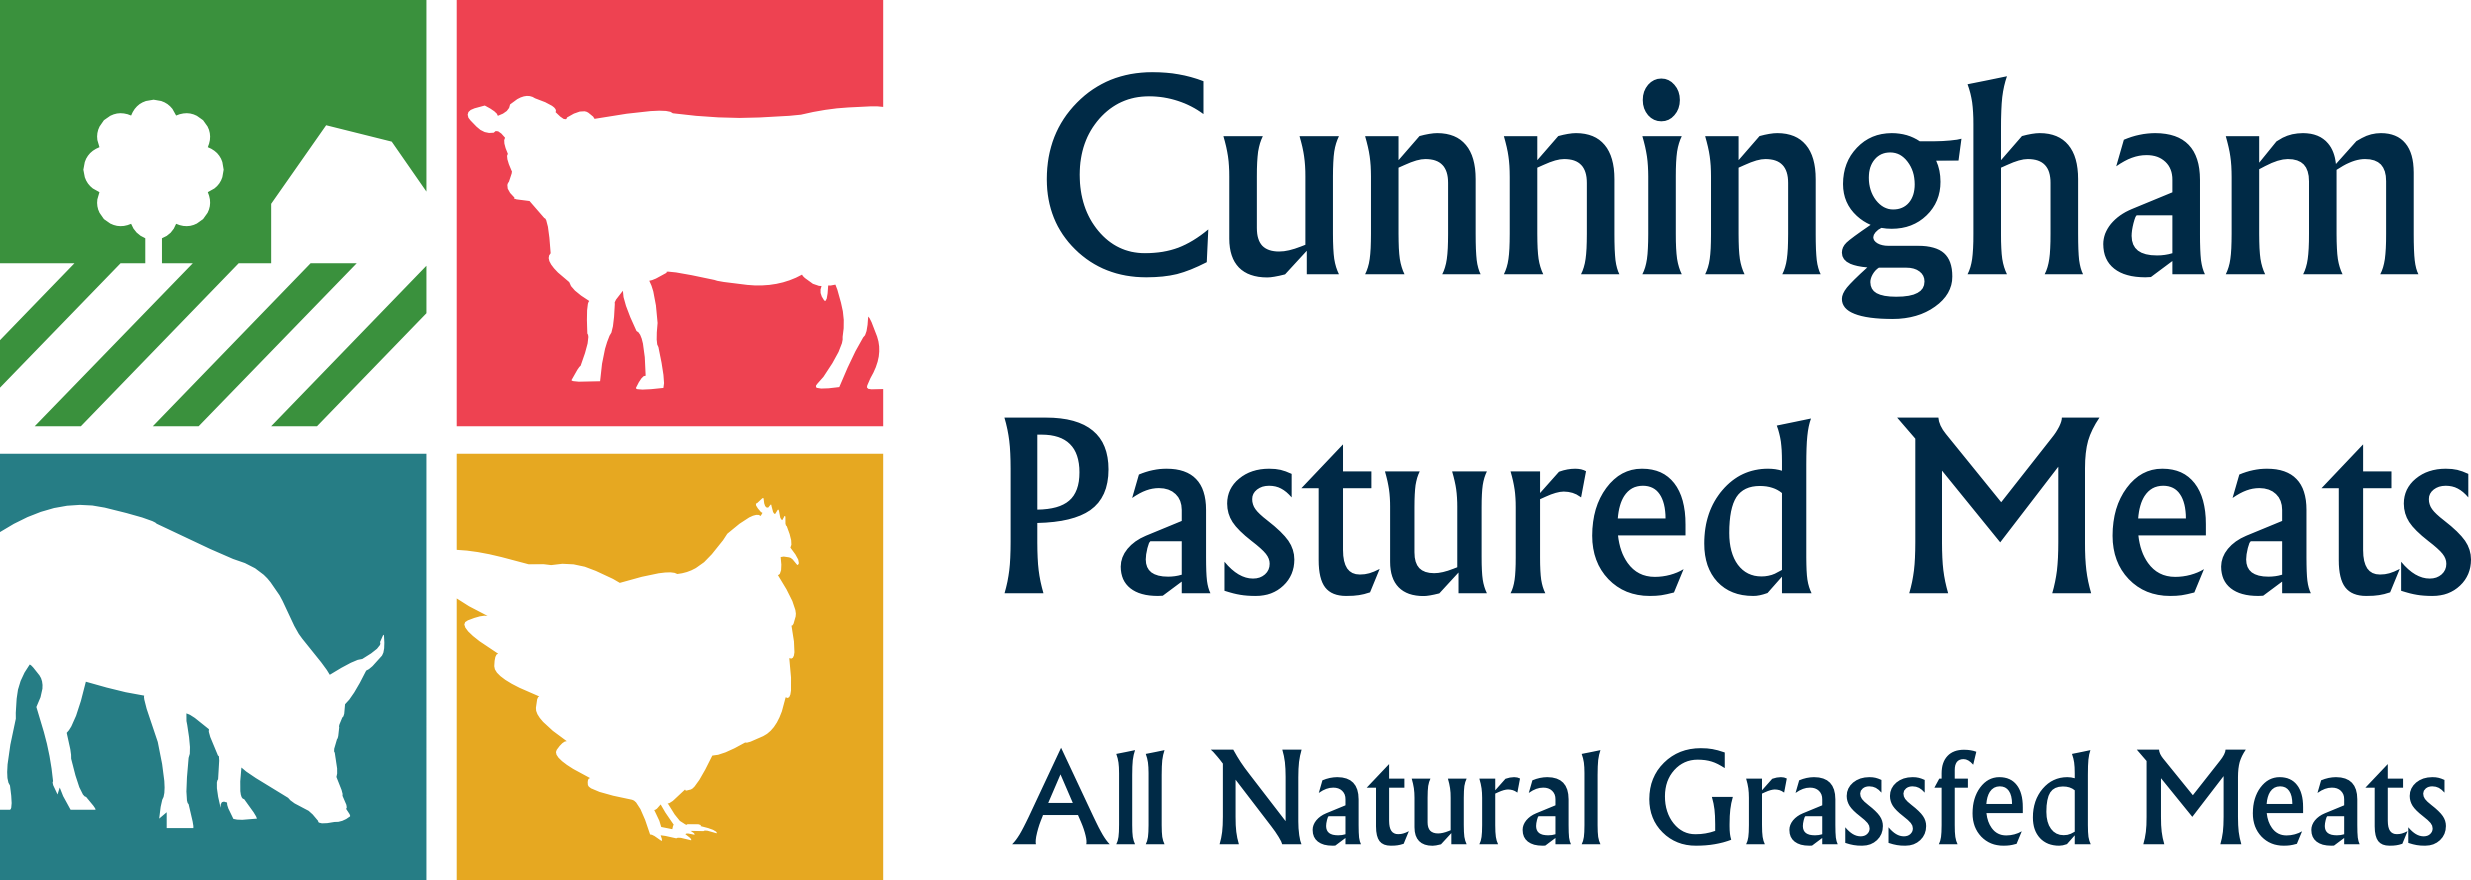 Cunningham Pastured Meats Logo